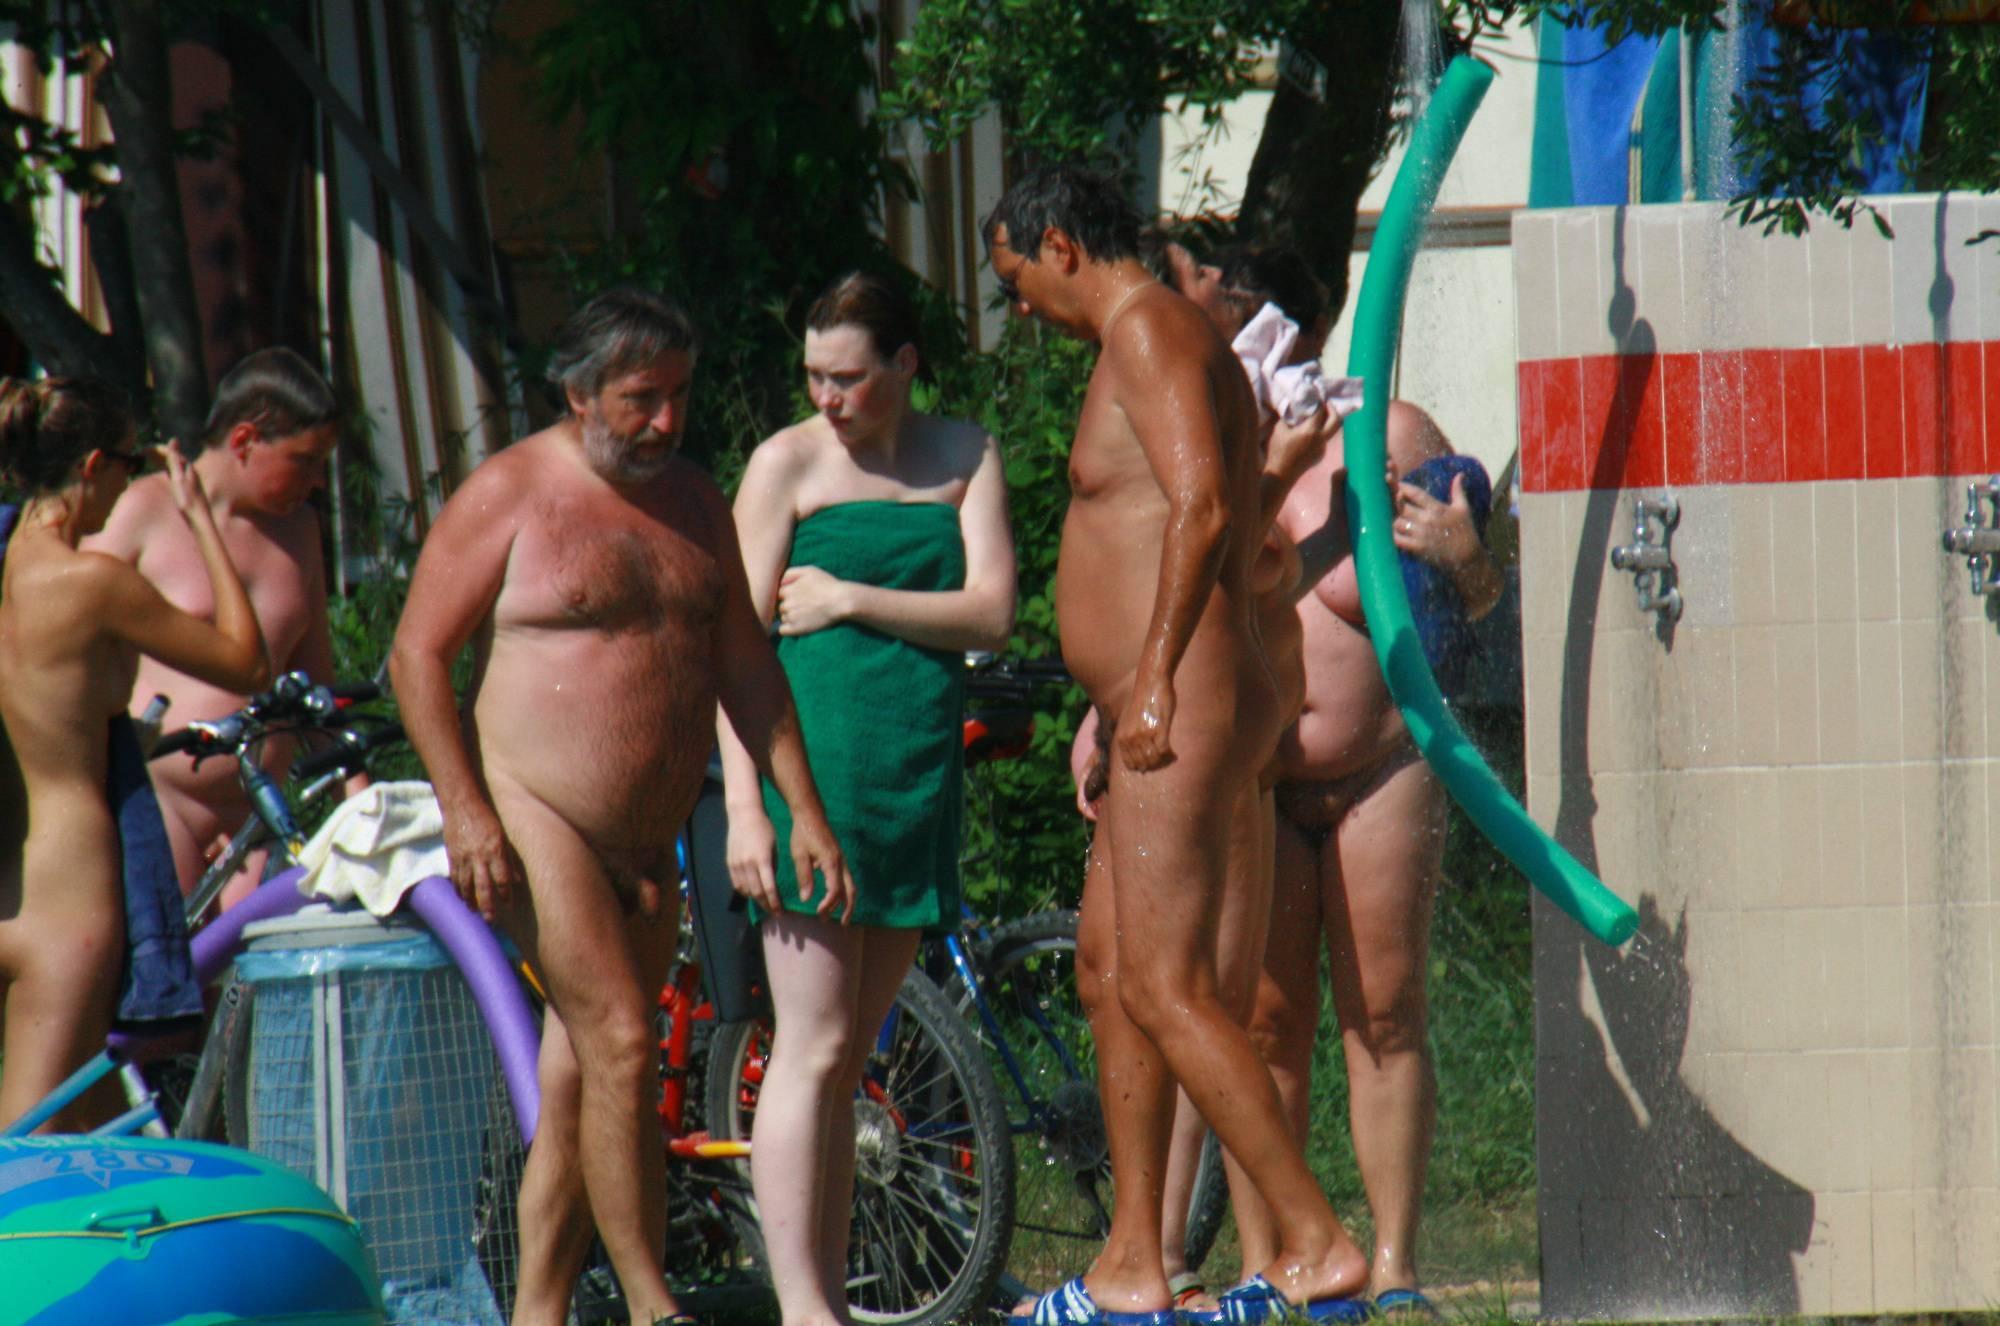 Naturist Outdoor Showers - 2